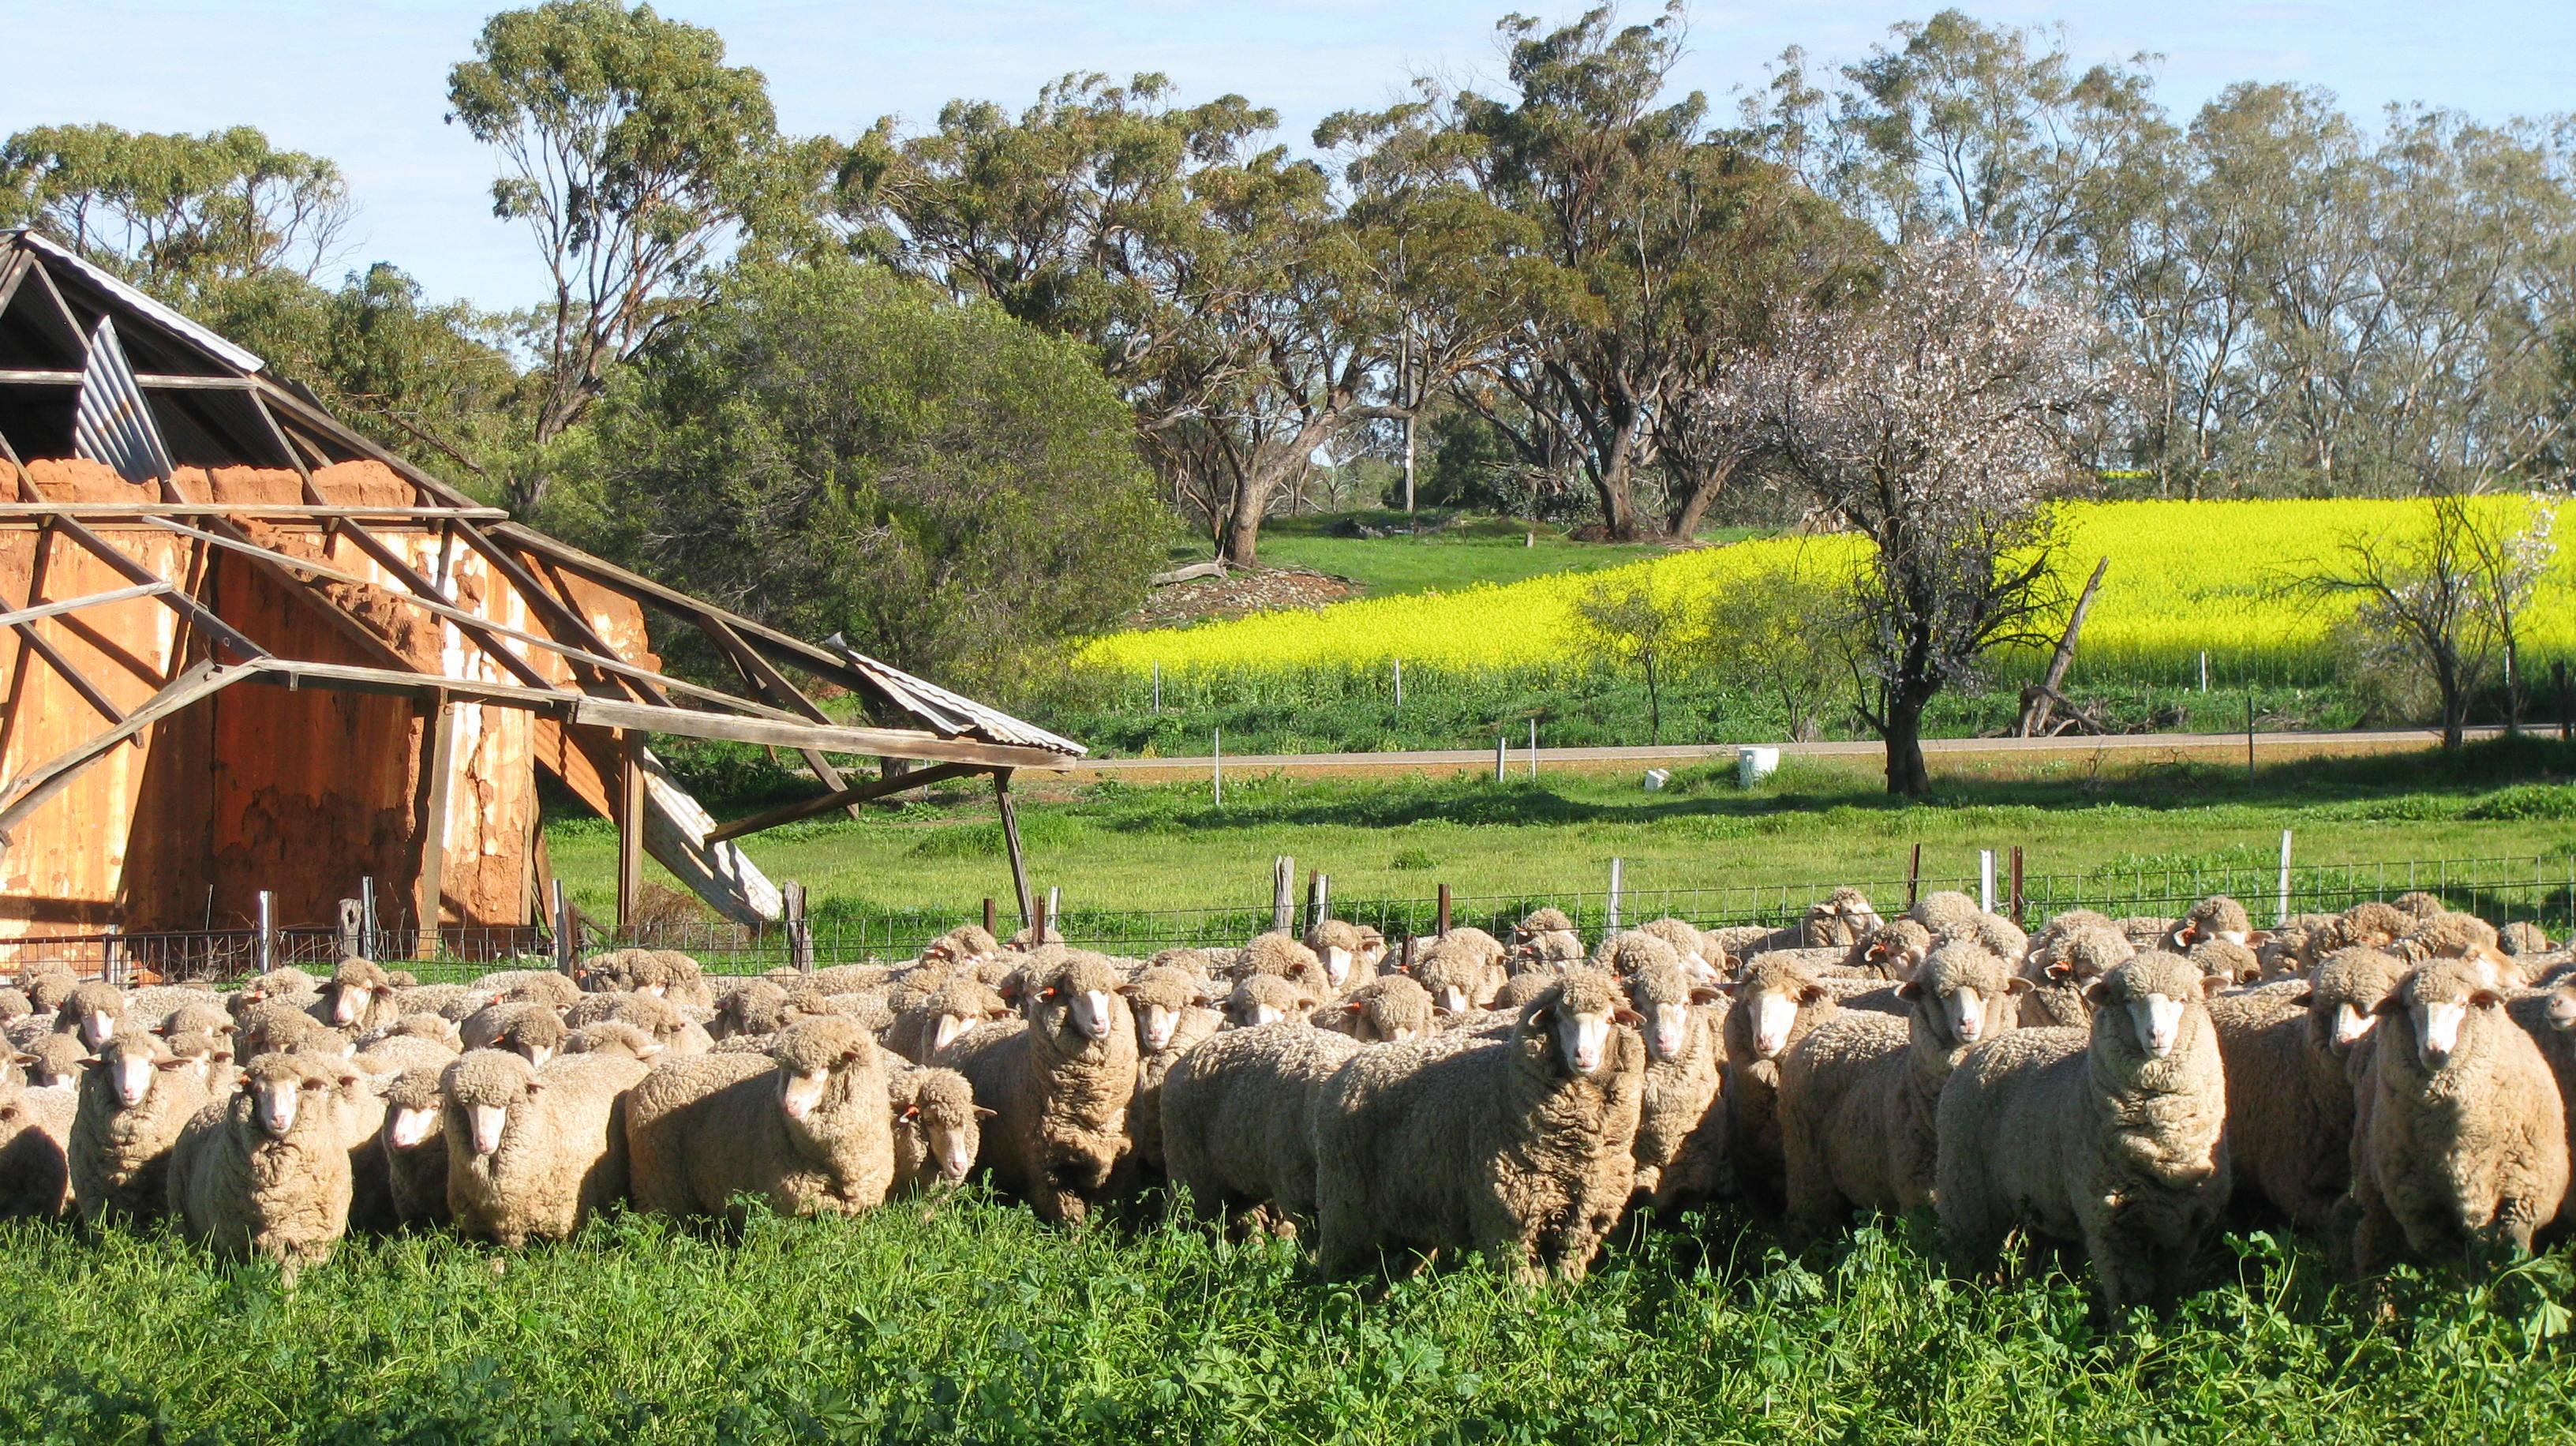 Merino sheep next to old mudbrick cottage, Goomalling, Western Australia